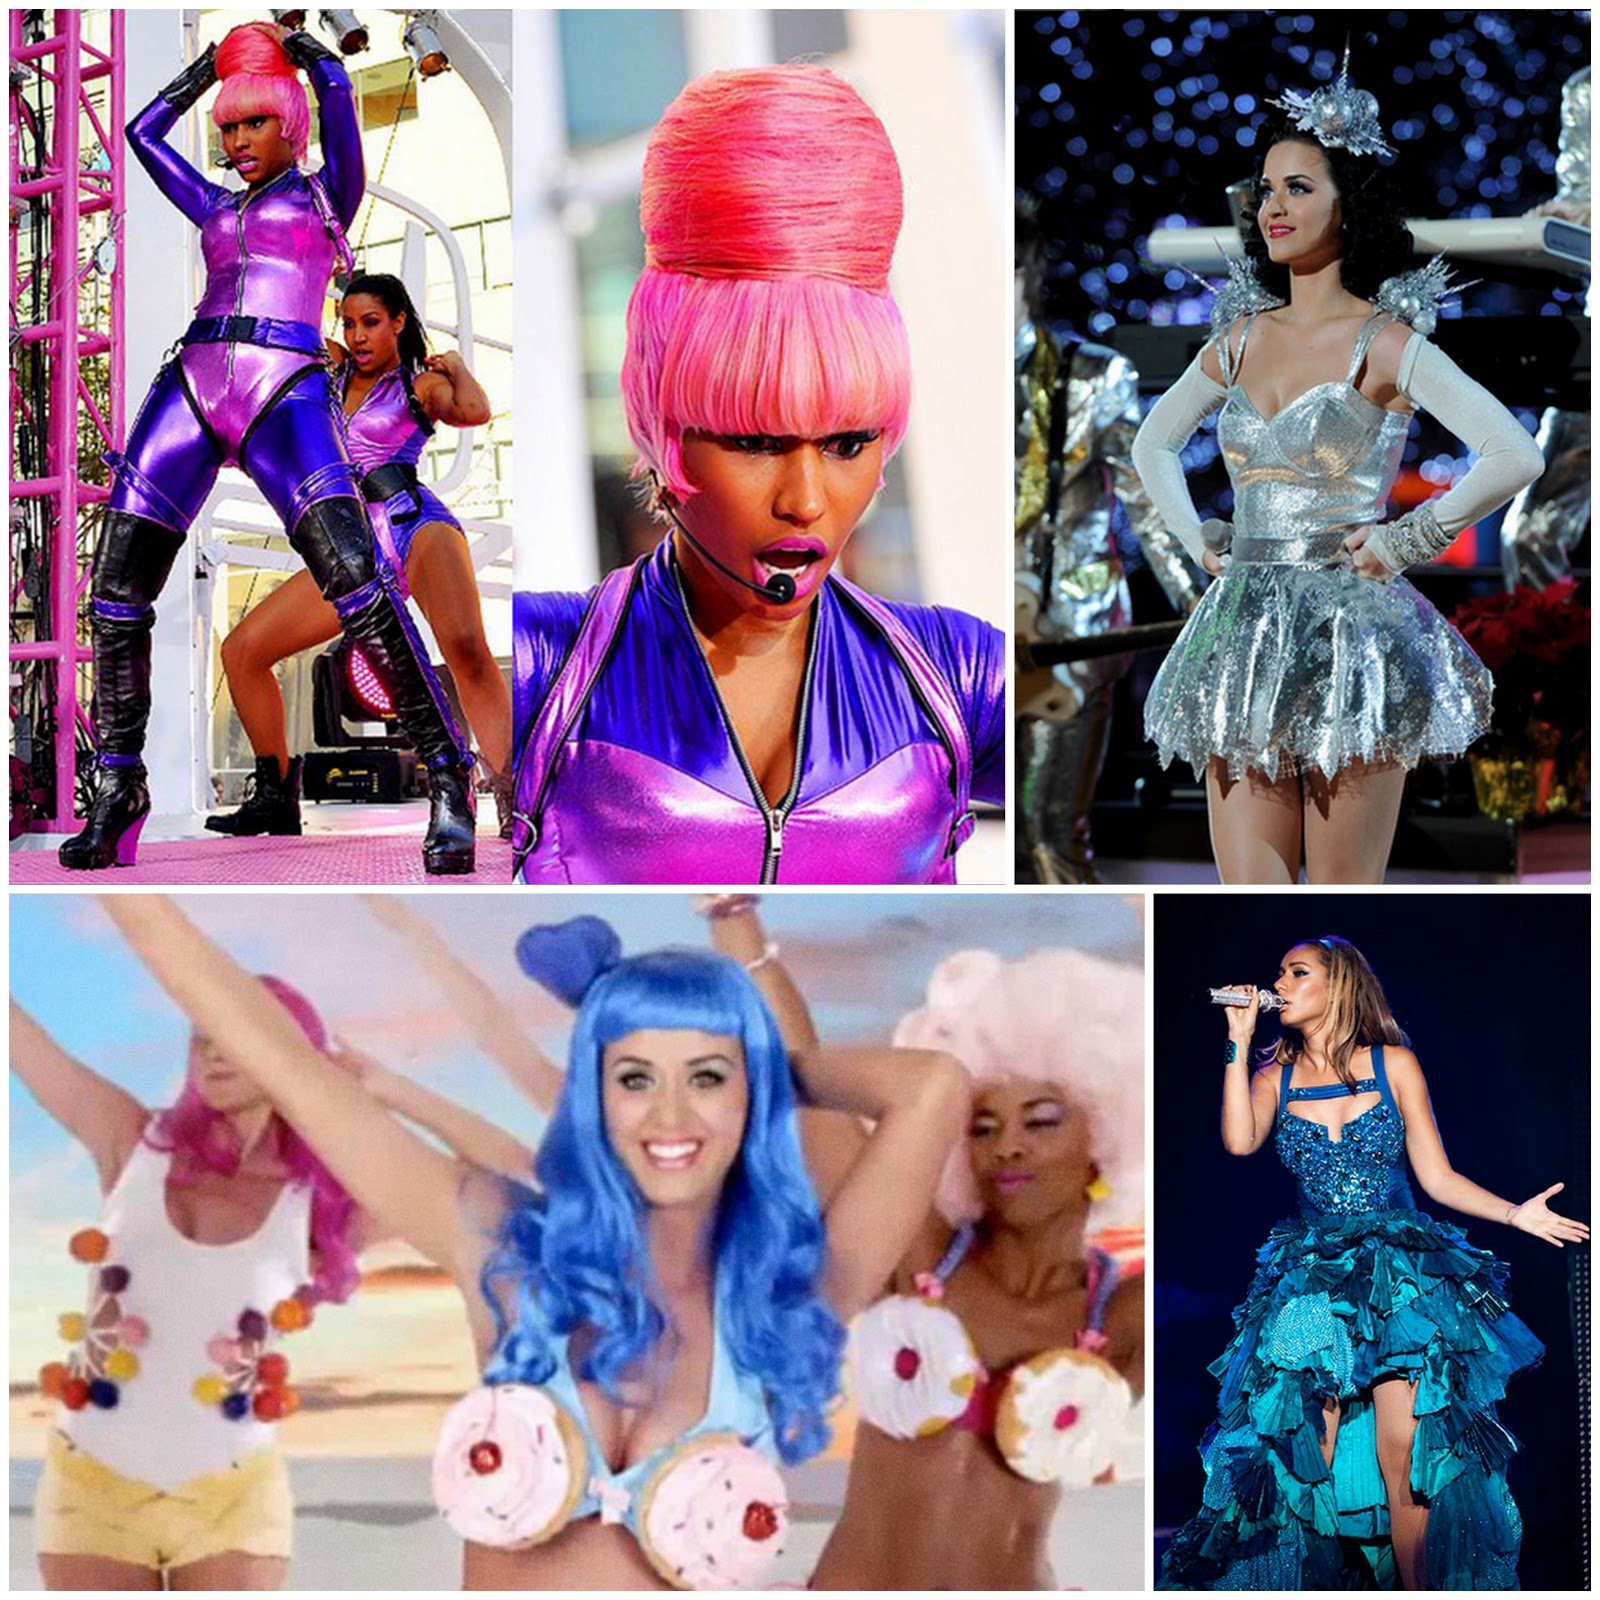 http://4.bp.blogspot.com/-Qhfqhg8SQJY/Tsr7_4Ix8MI/AAAAAAAAHHc/mJBYyF1vpVo/s1600/katie+perry+marc+marco+cupcake+bra+nicki+minaj+leona+lewis+stage+costume.jpg